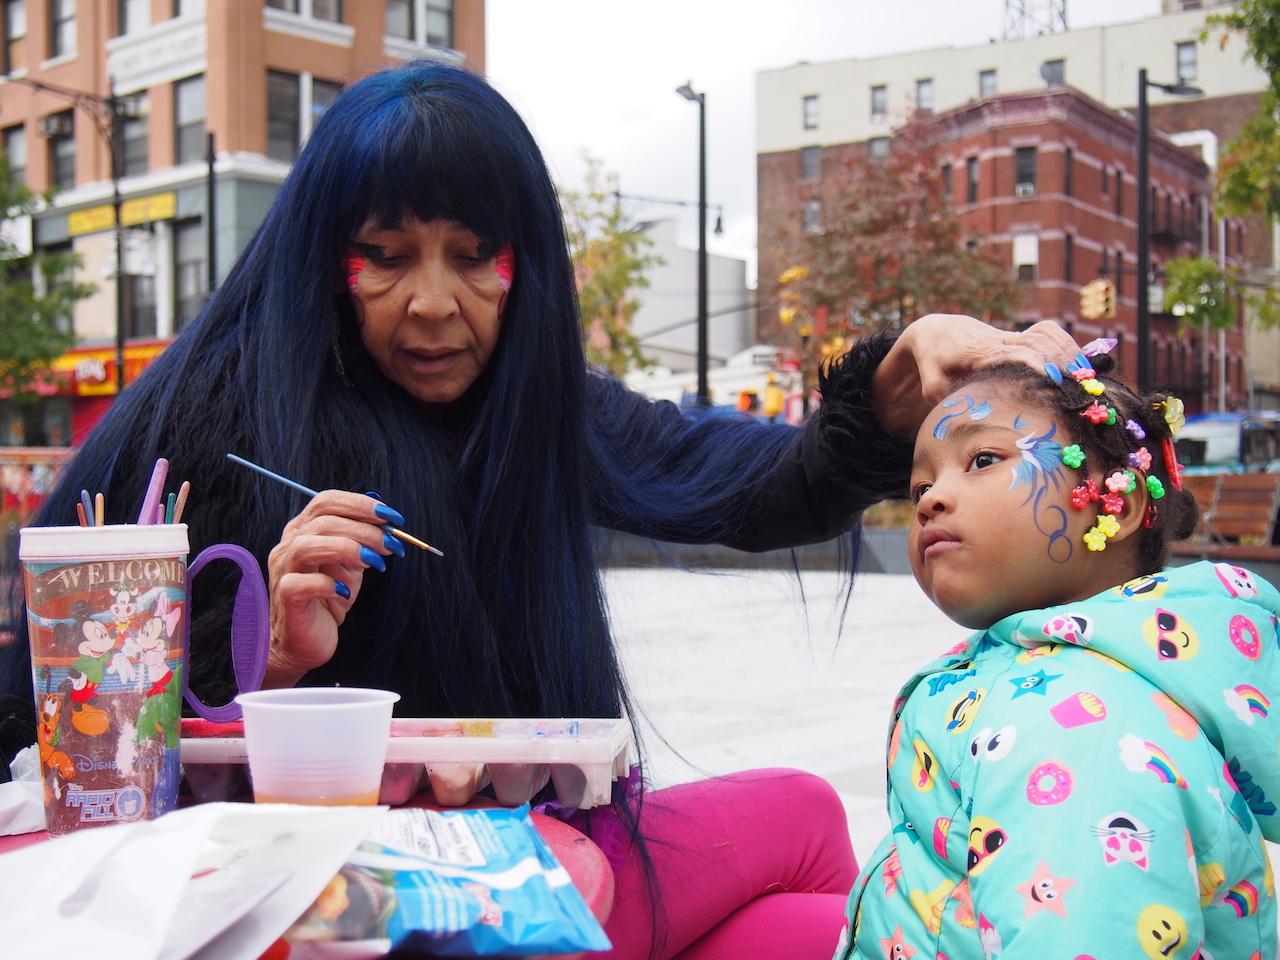 Pumpkin festival held at long-awaited Roberto Clemente Plaza